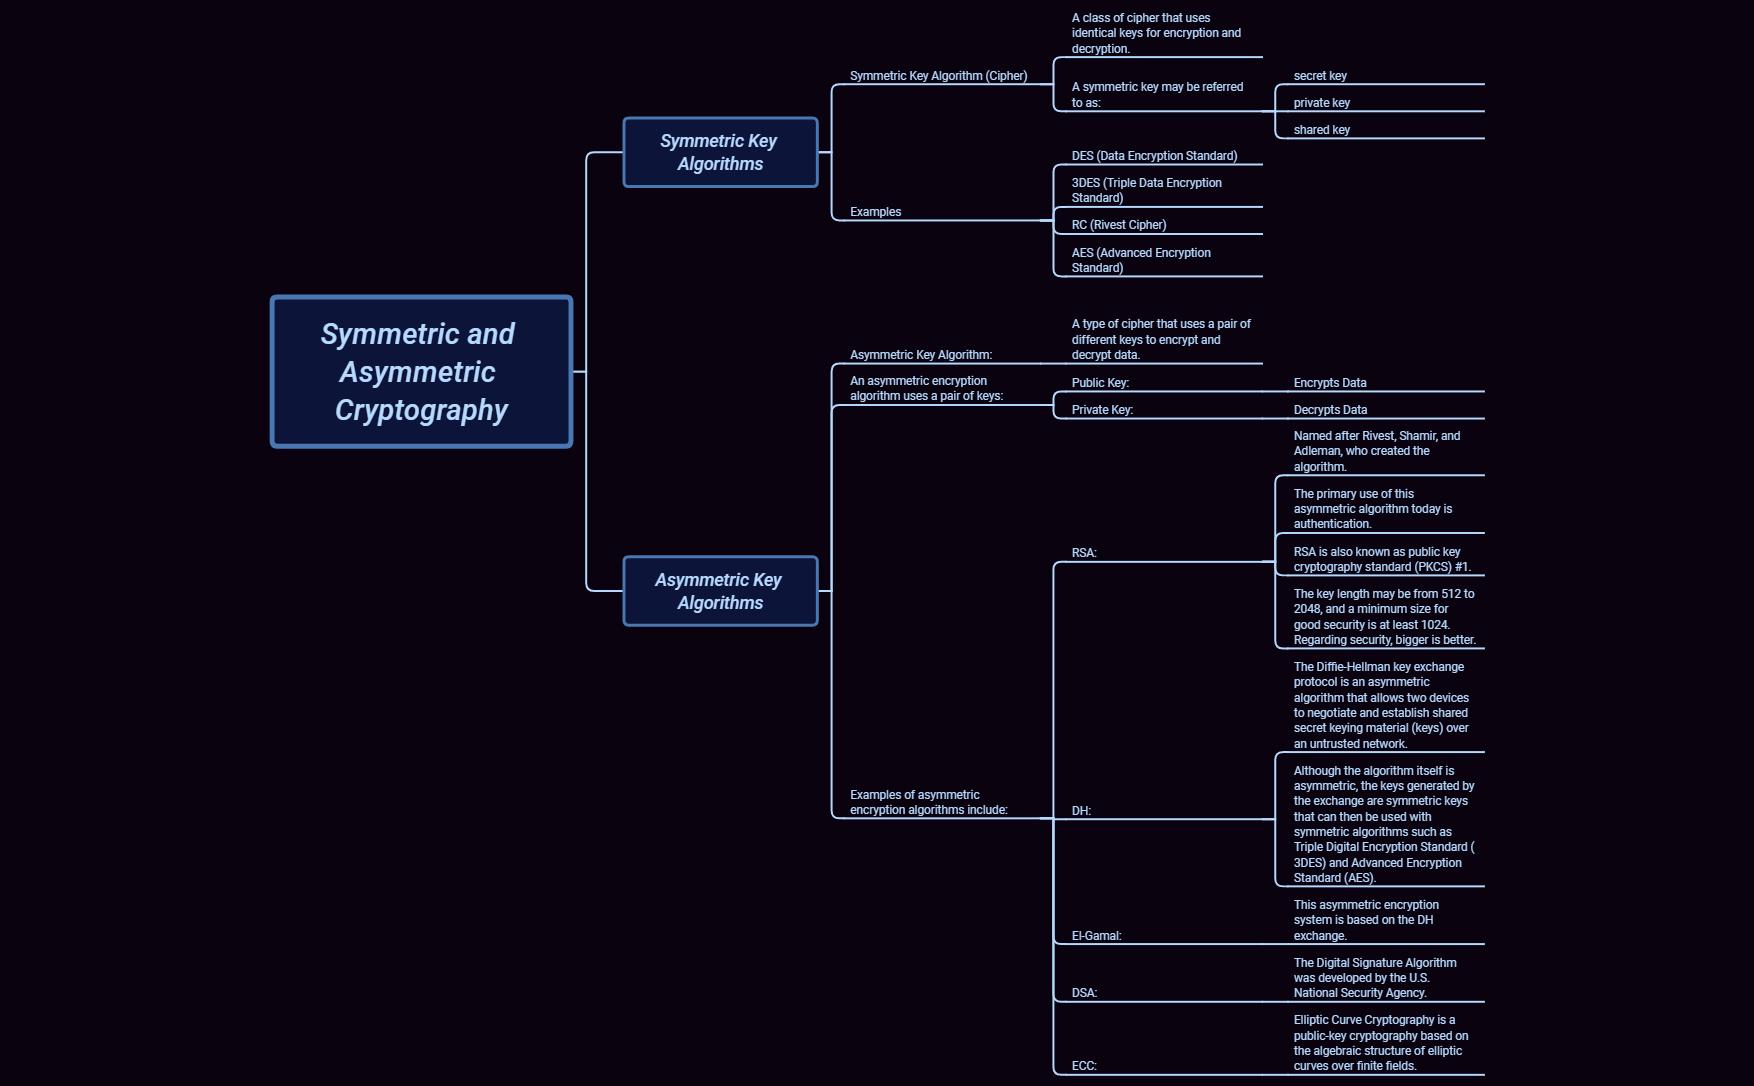 6 1 2 Symmetric and Asymmetric Cryptography - XMind - Mind